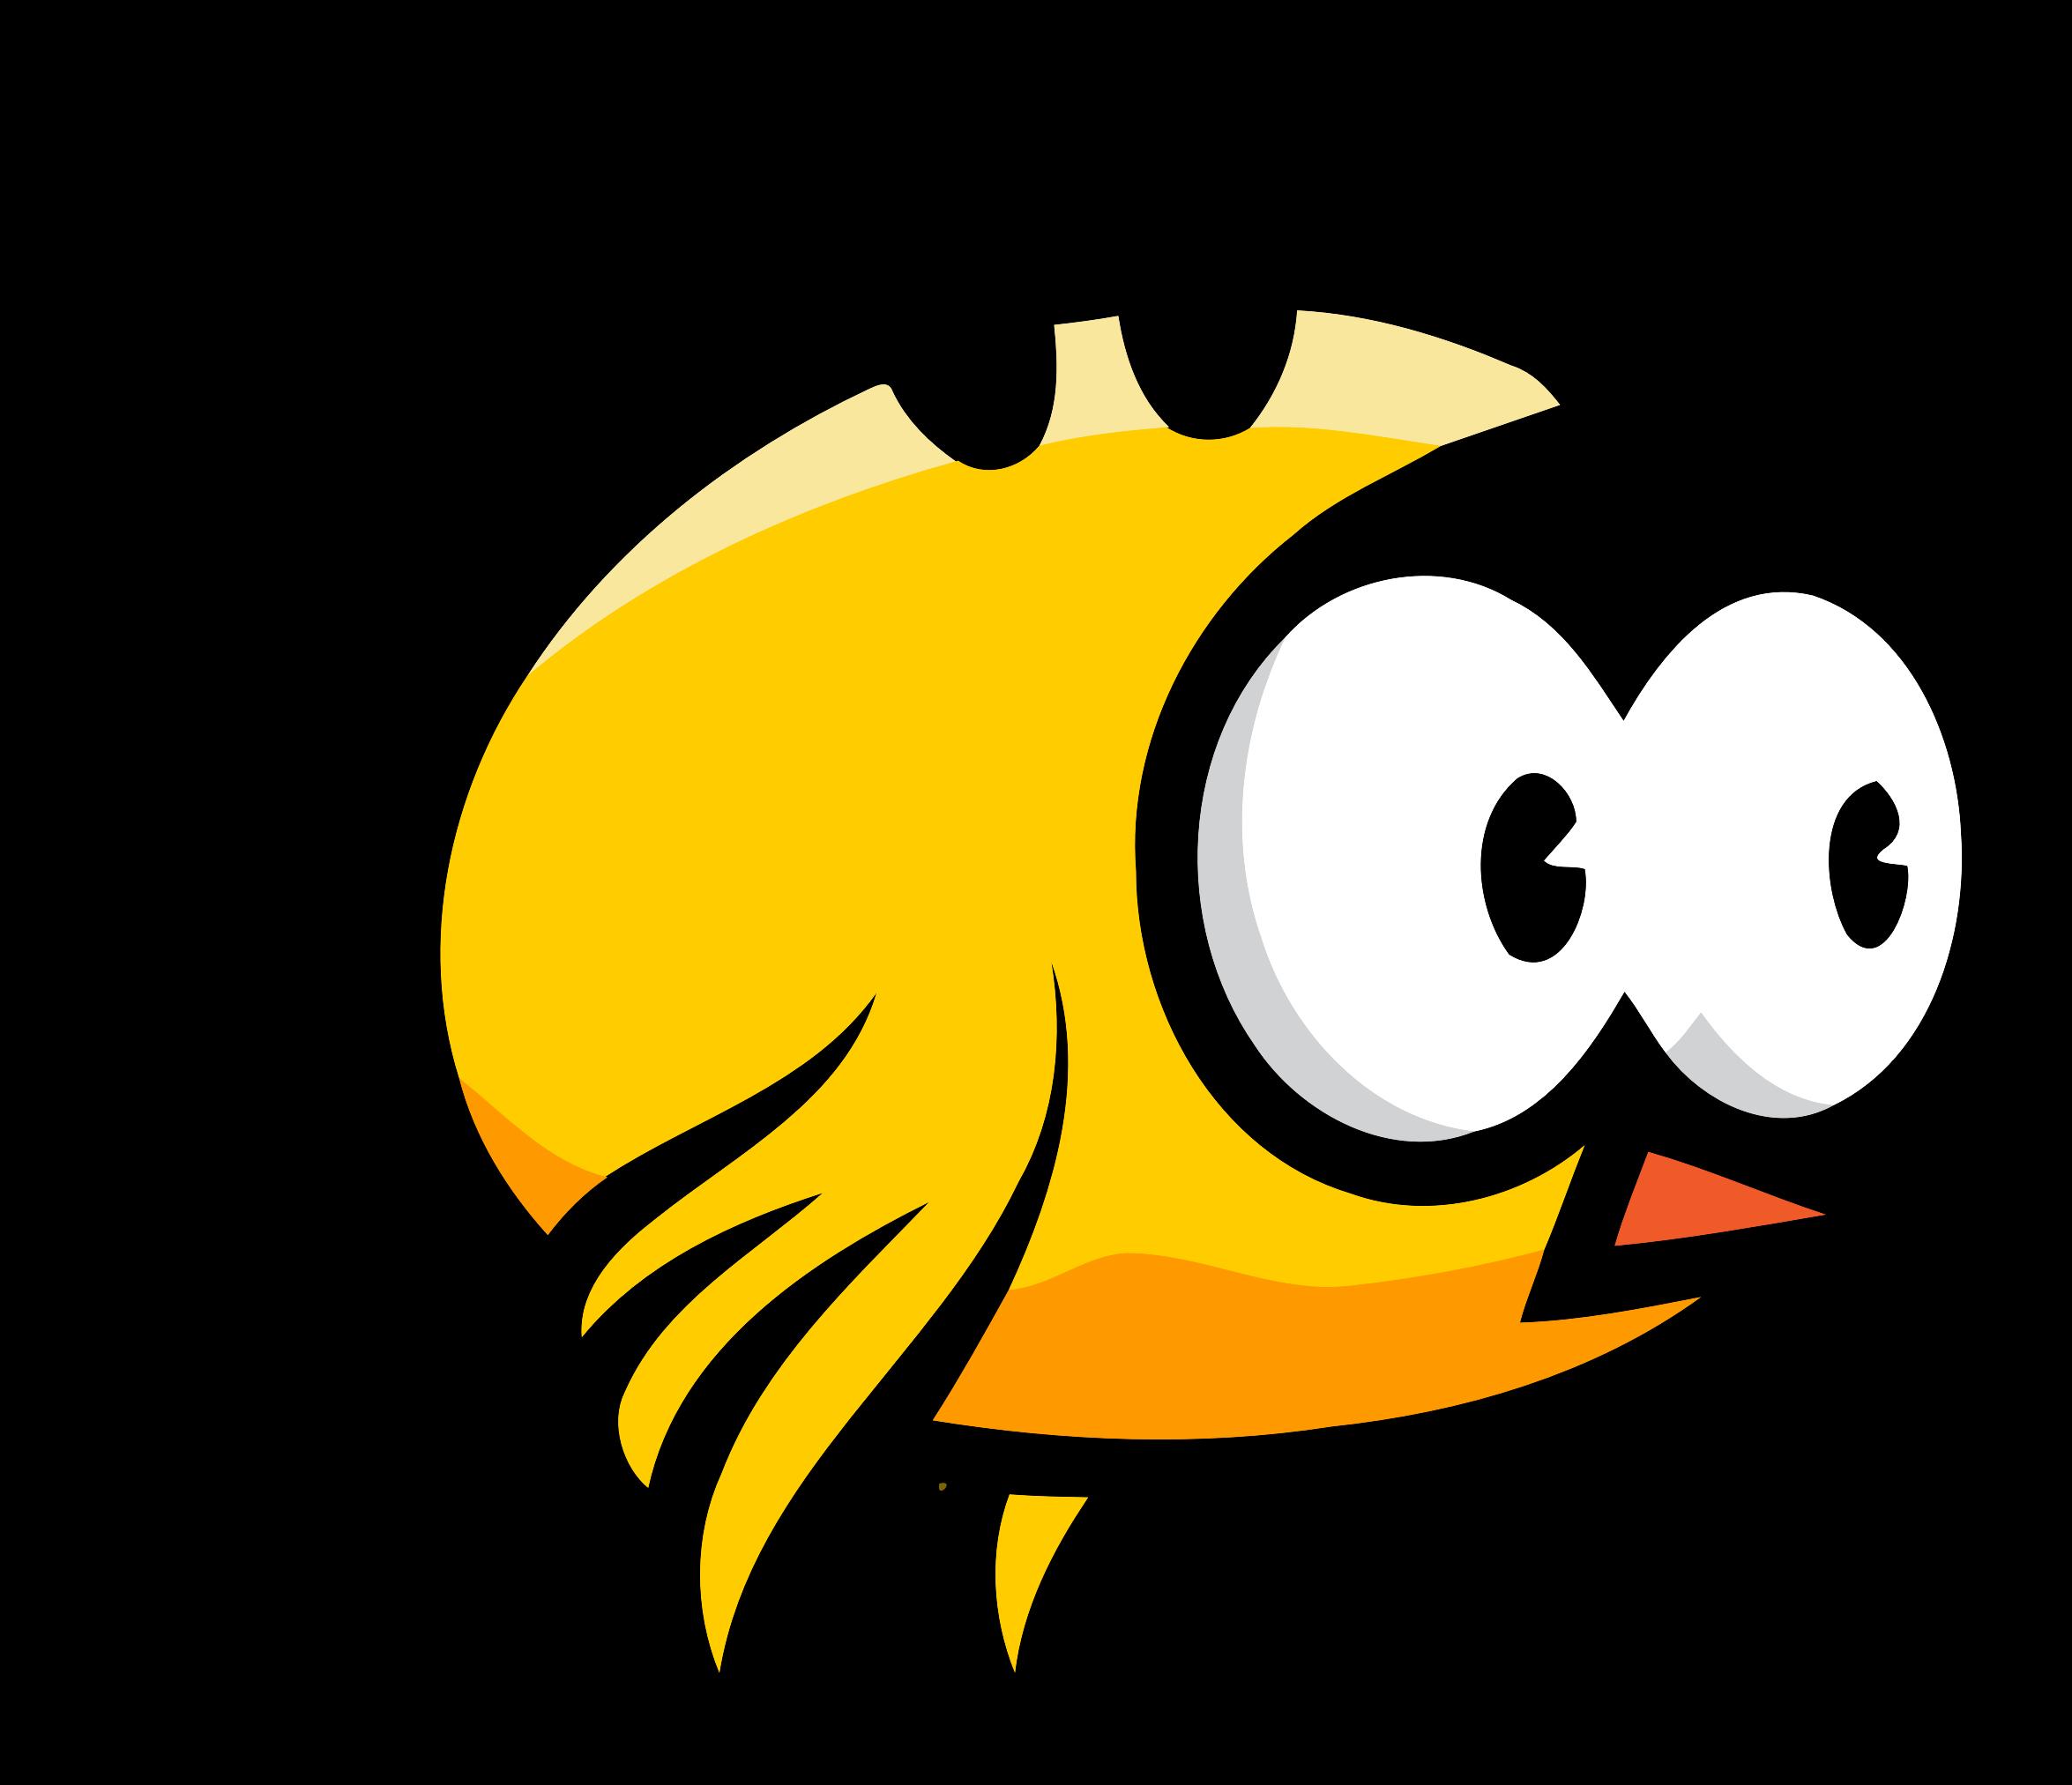 Clipart birds yellow. Flying bird frame big